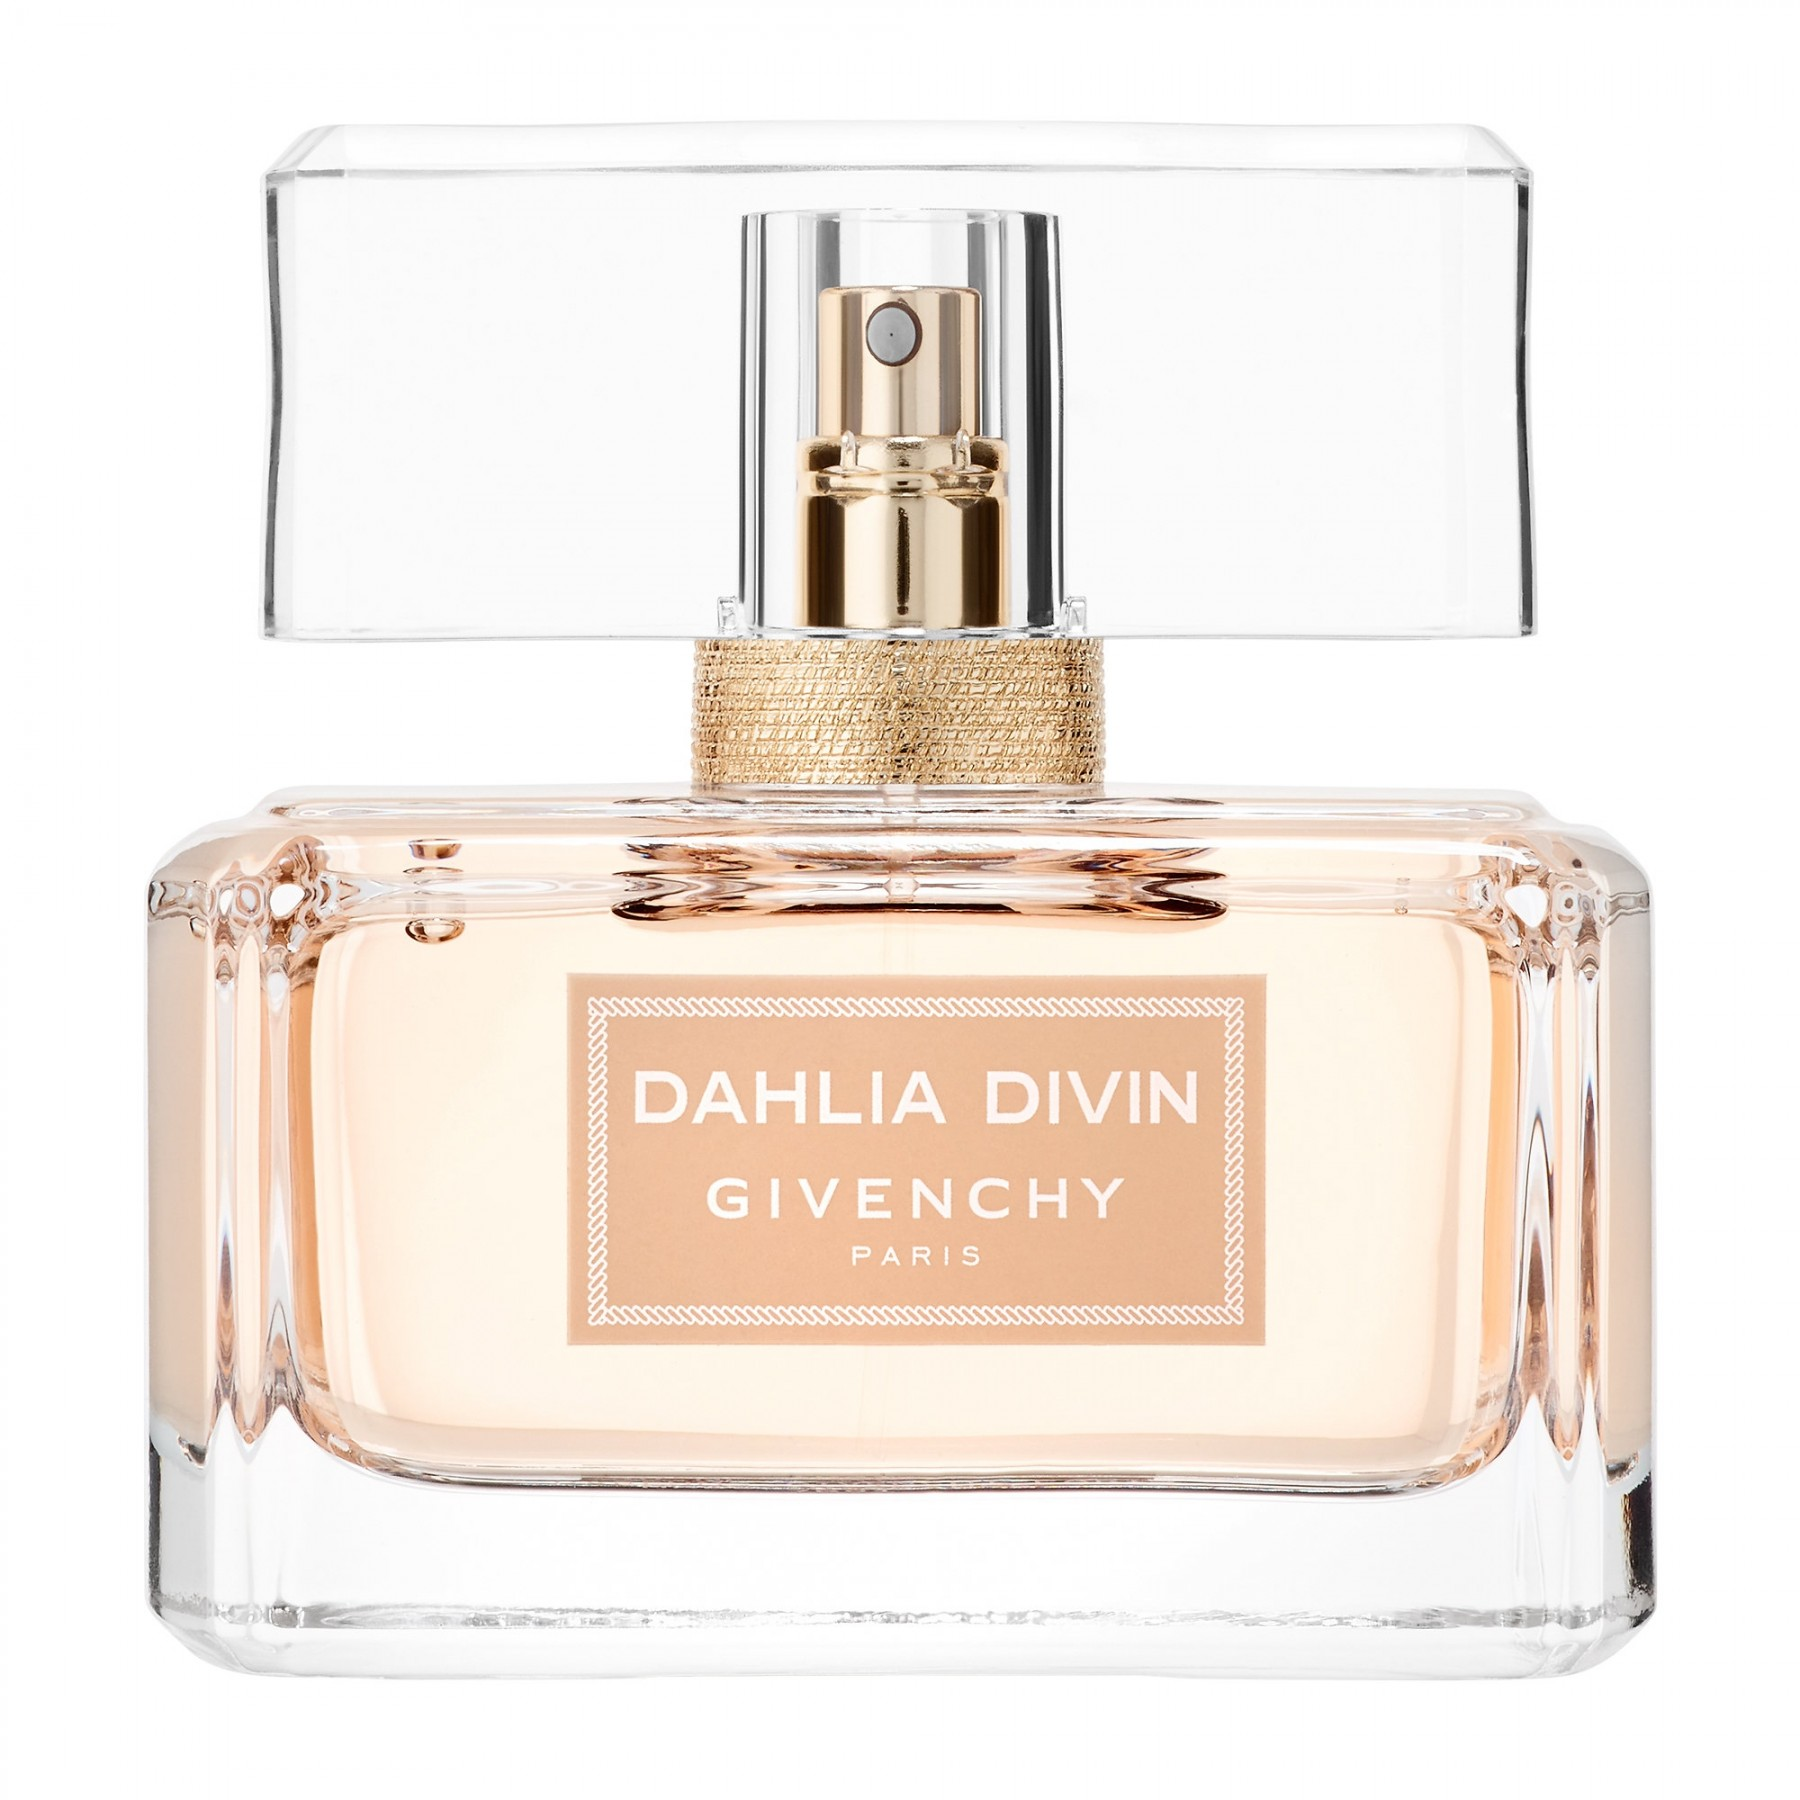 ادو پرفیوم زنانه ژیوانشی مدل Dahlia Divin Nude حجم 75 میلی لیتر